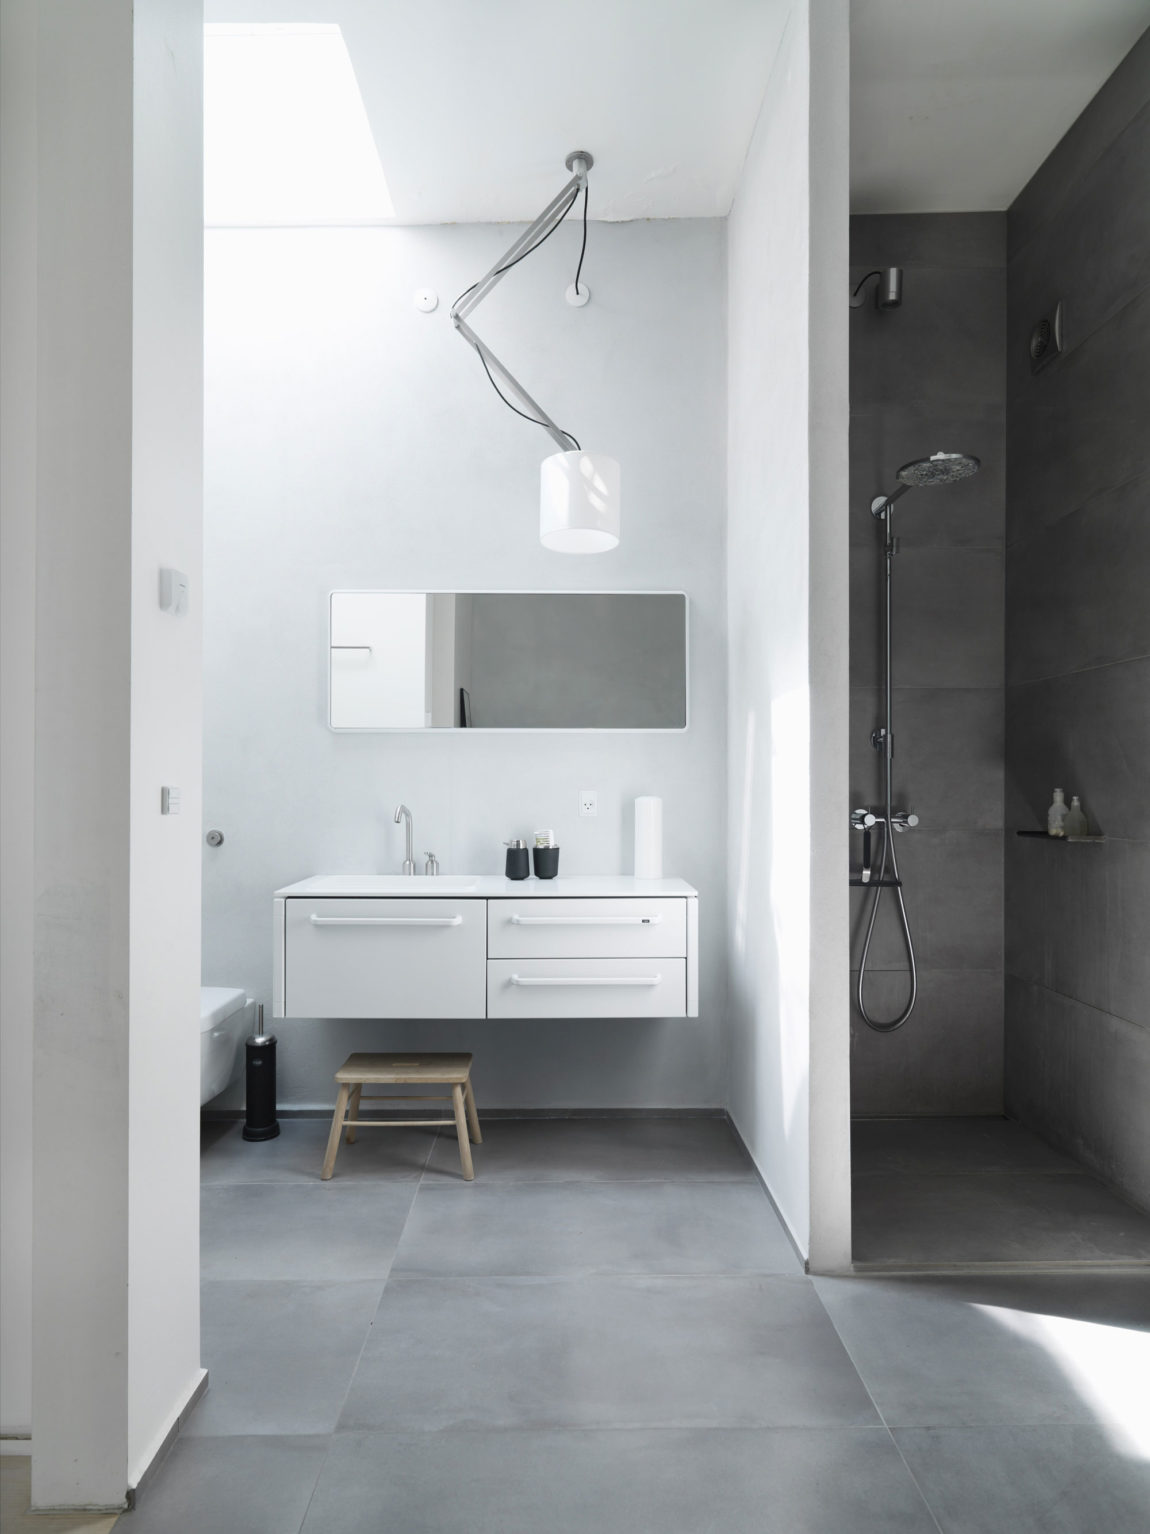 The Home of Morten Bo Jensen by Vipp (17)